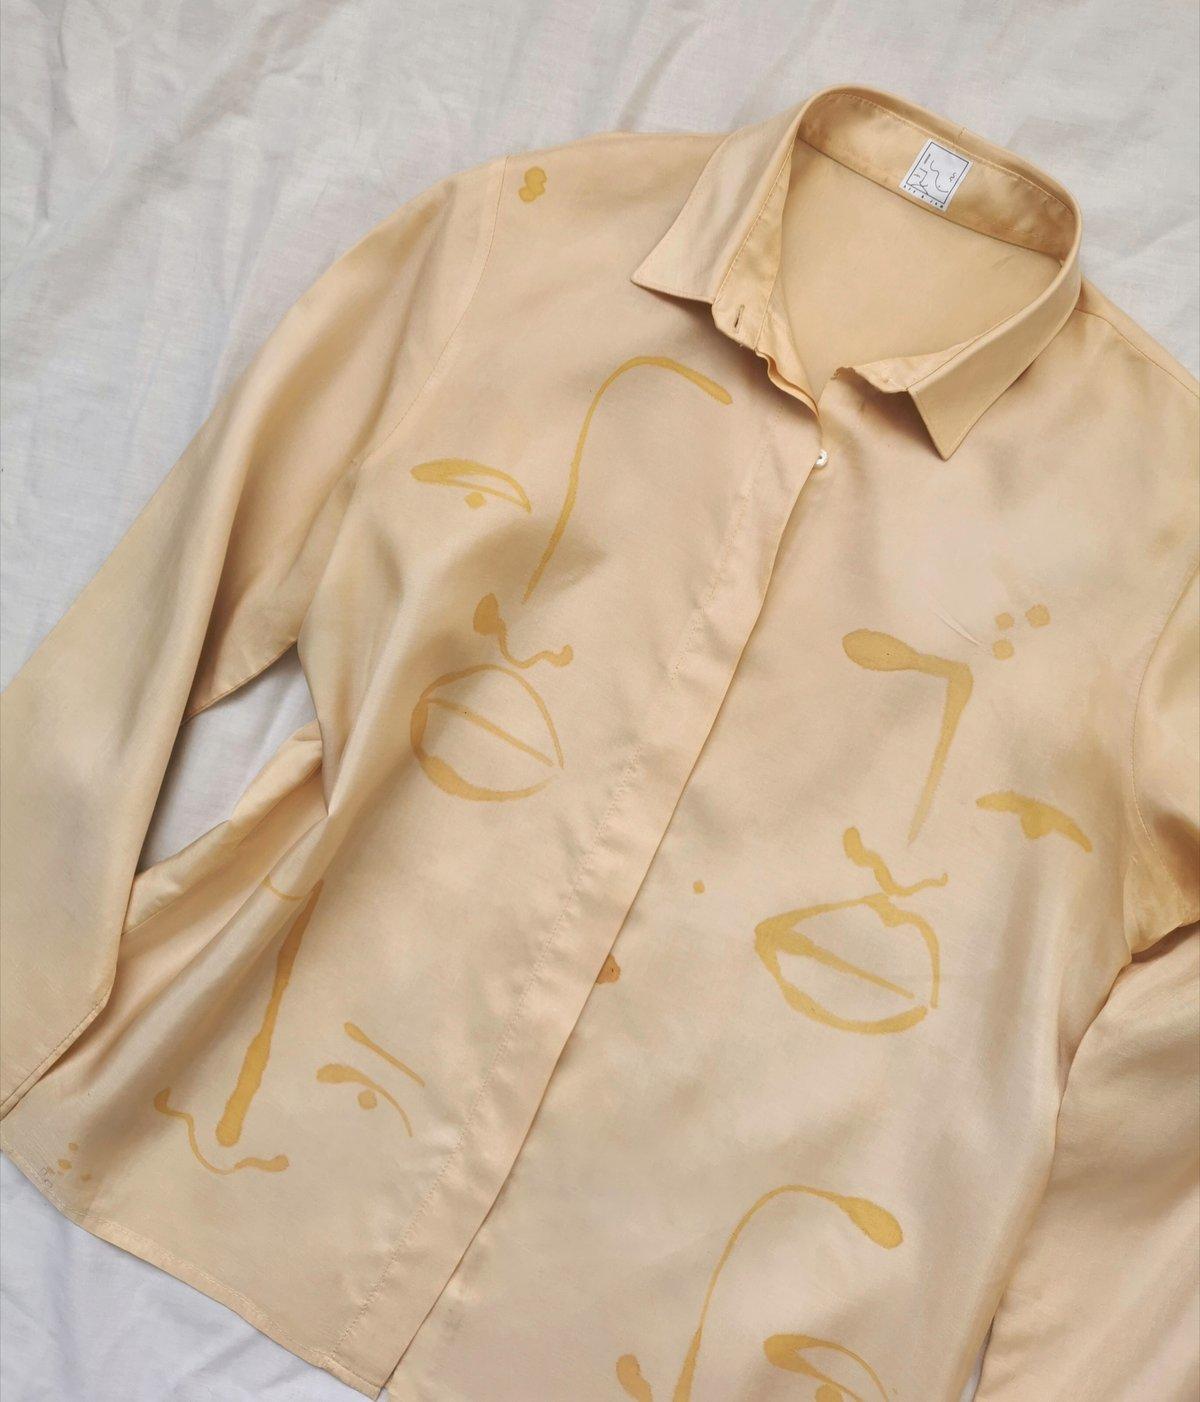 Image of go golden blouse